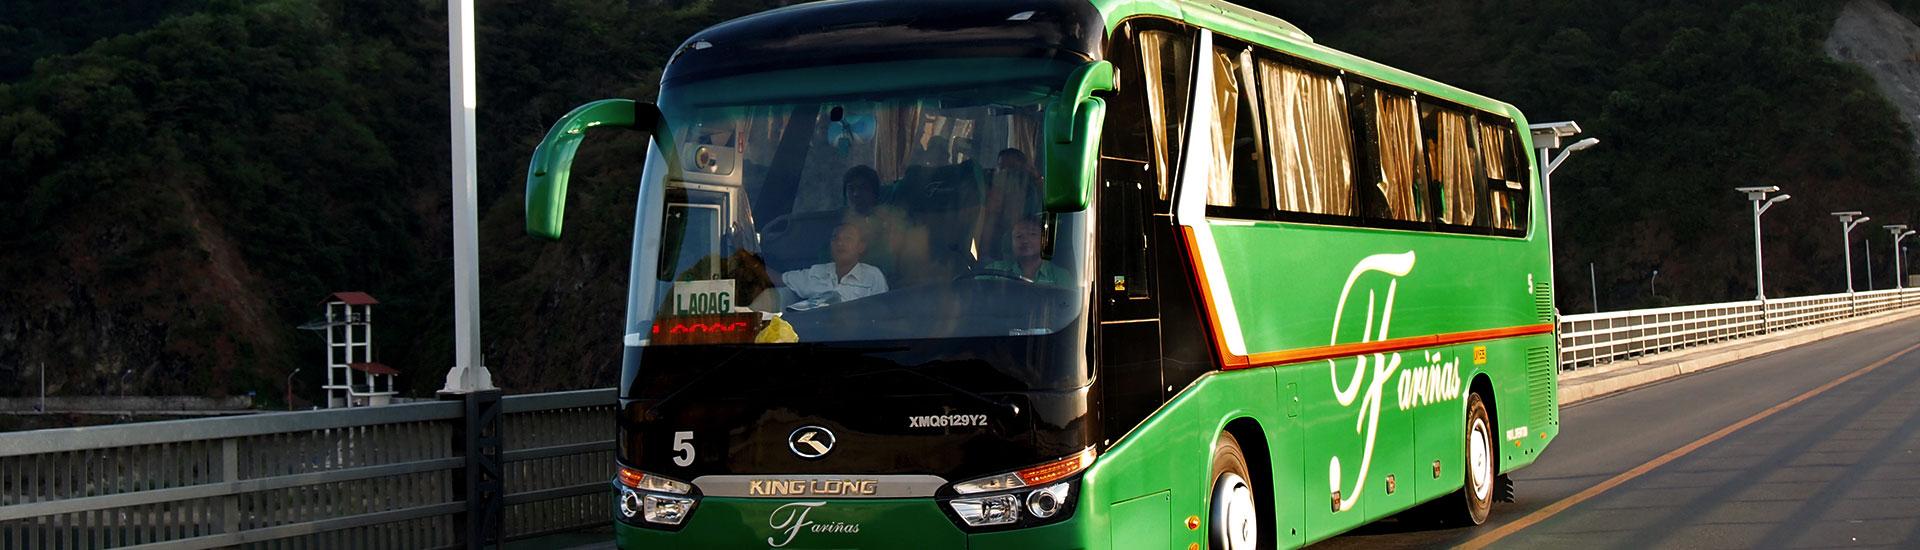 Fariñas Trans Laoag-Manila-Baguio